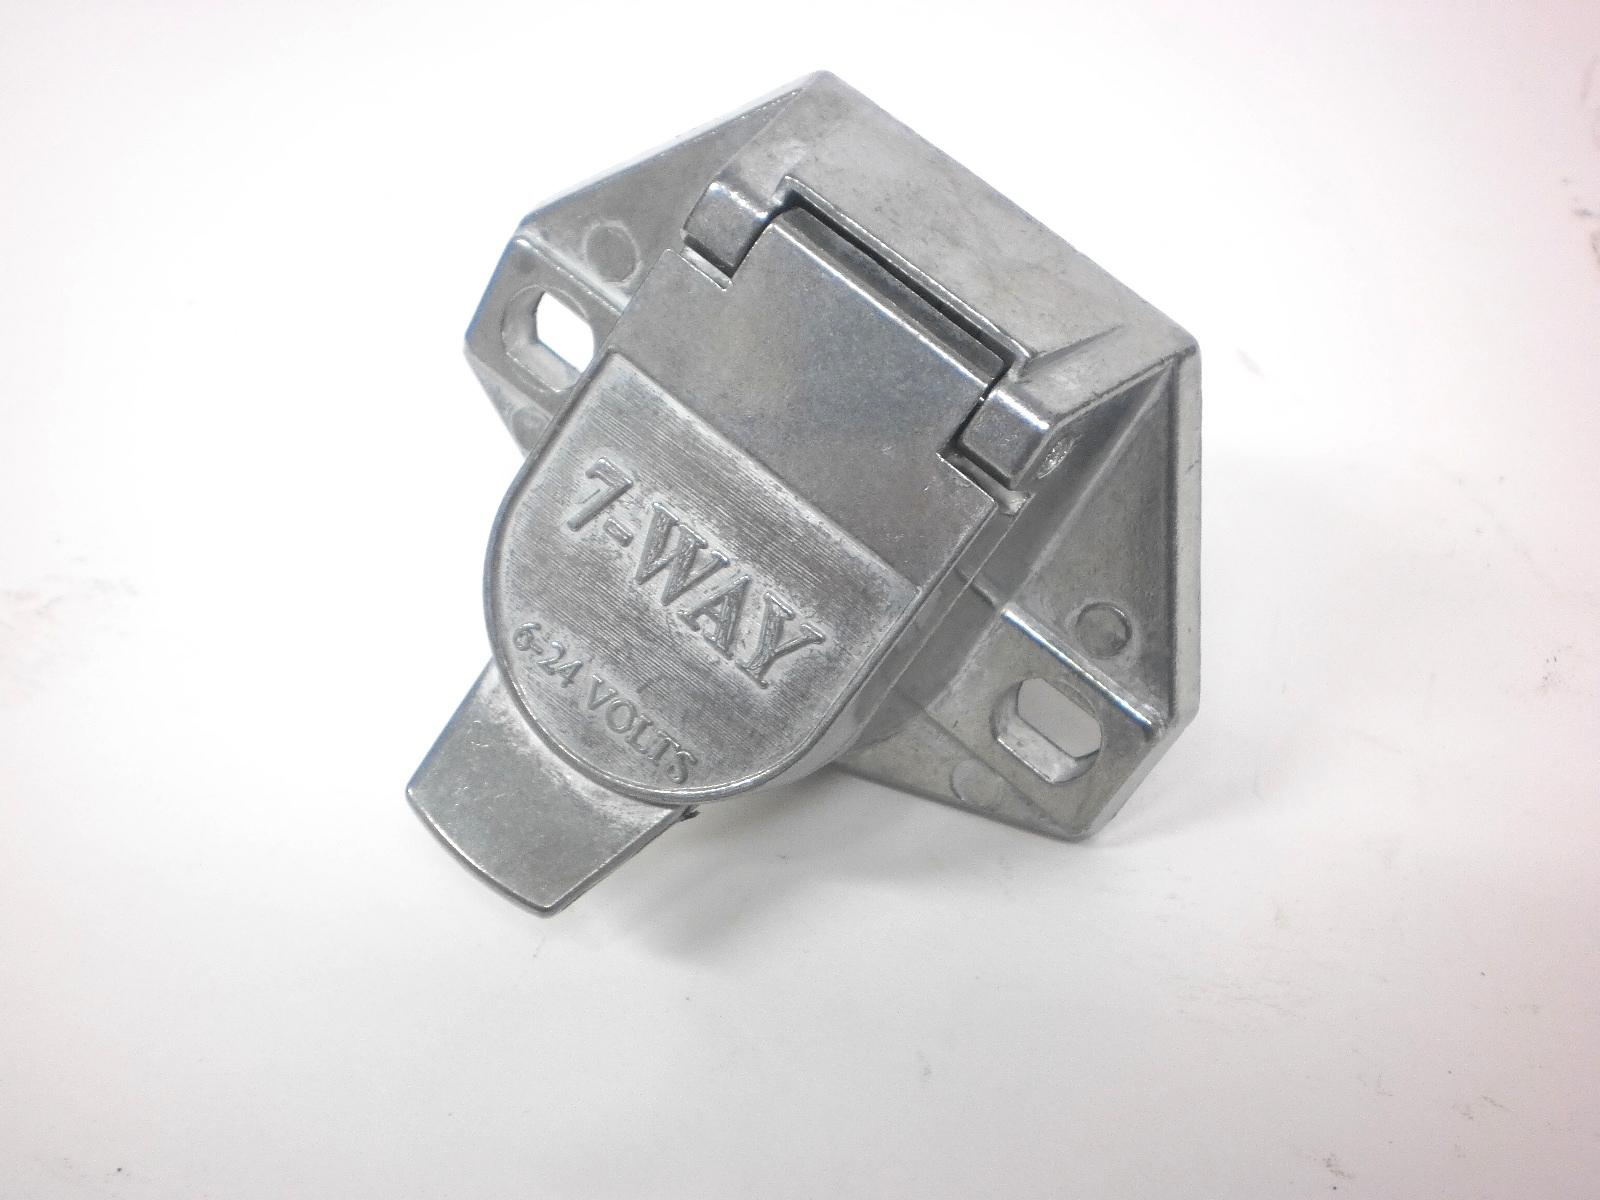 truck end plug 7 way pin rv connector light plug for cord. Black Bedroom Furniture Sets. Home Design Ideas